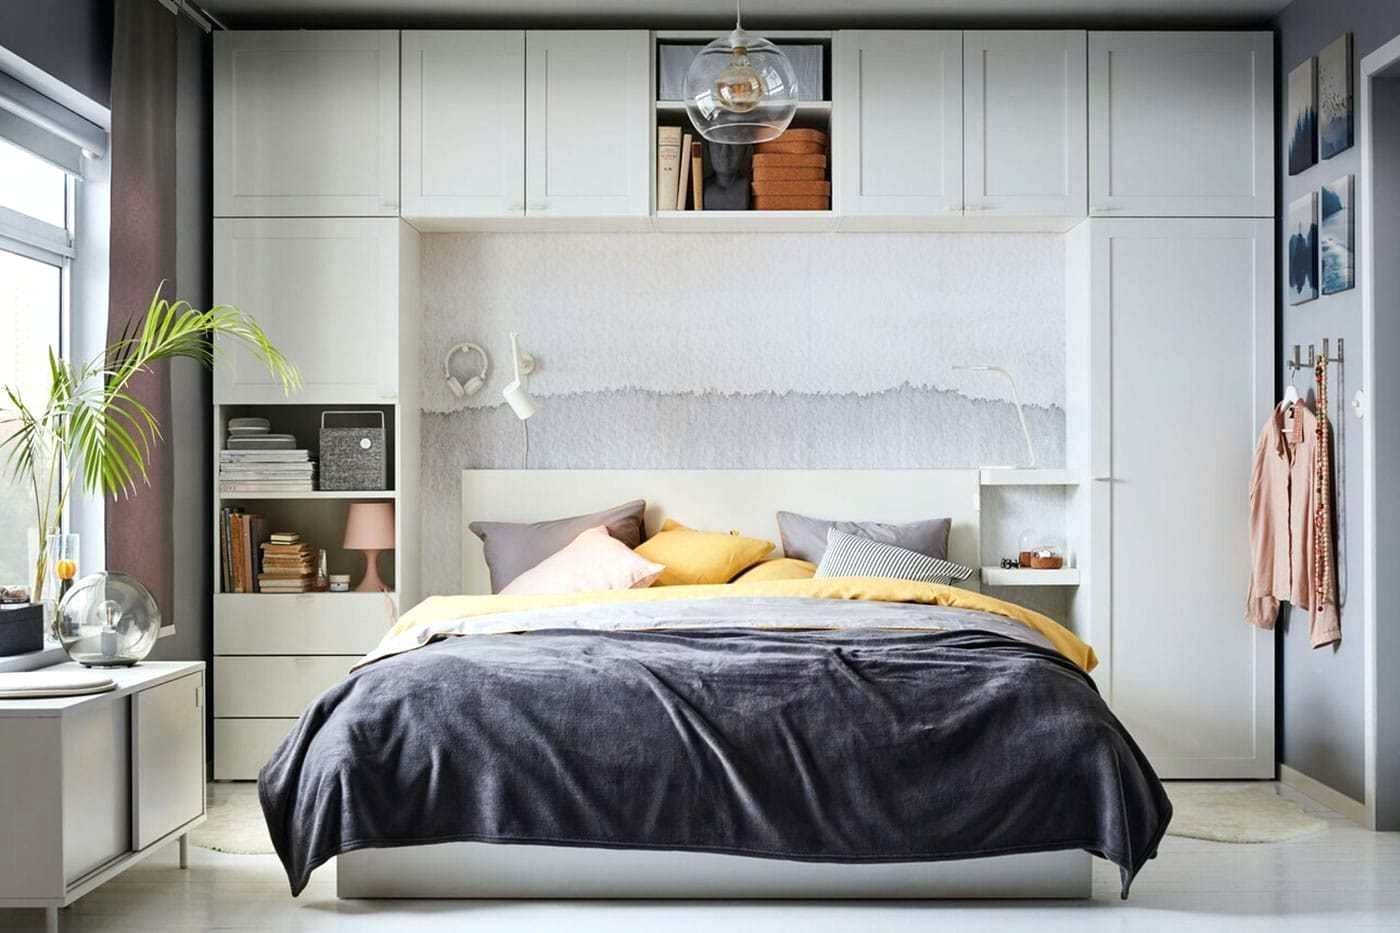 Refreshing Small Bedroom Ideas For Couple In 2020 Storage Ikea Dubai Khalifa